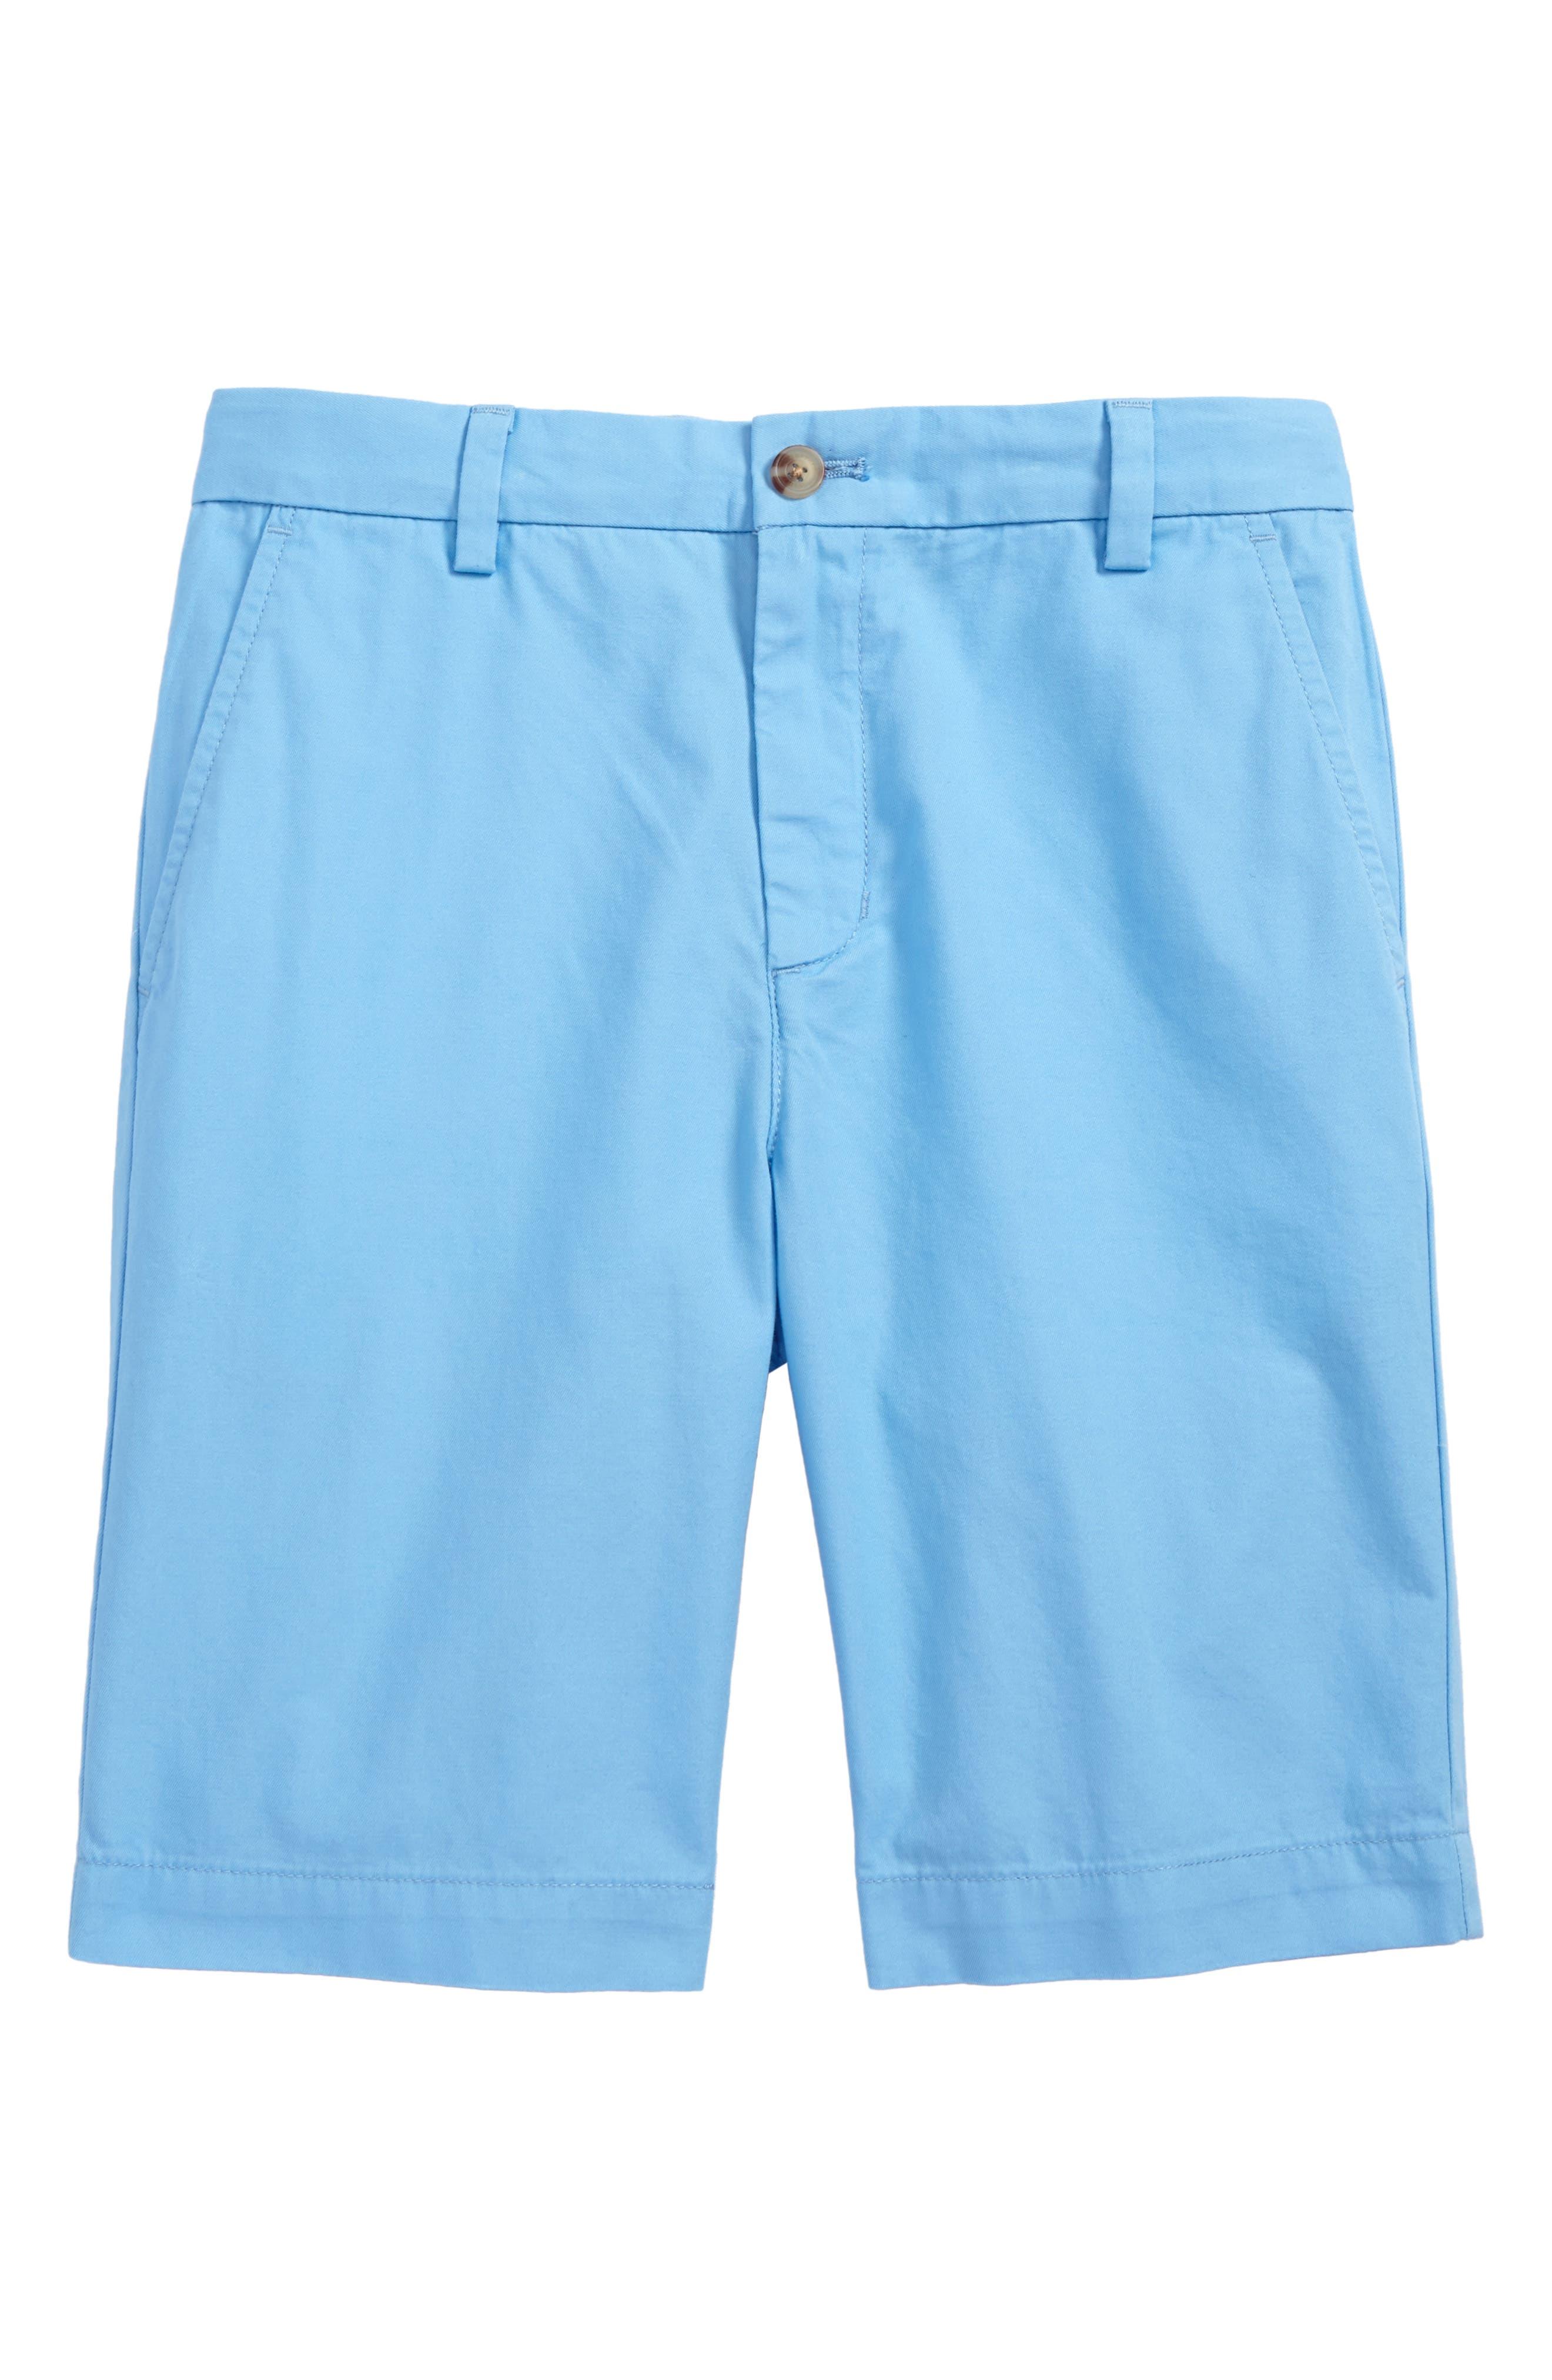 Main Image - vineyard vines Summer - Breaker Twill Shorts (Toddler Boys, Little Boys & Big Boys)